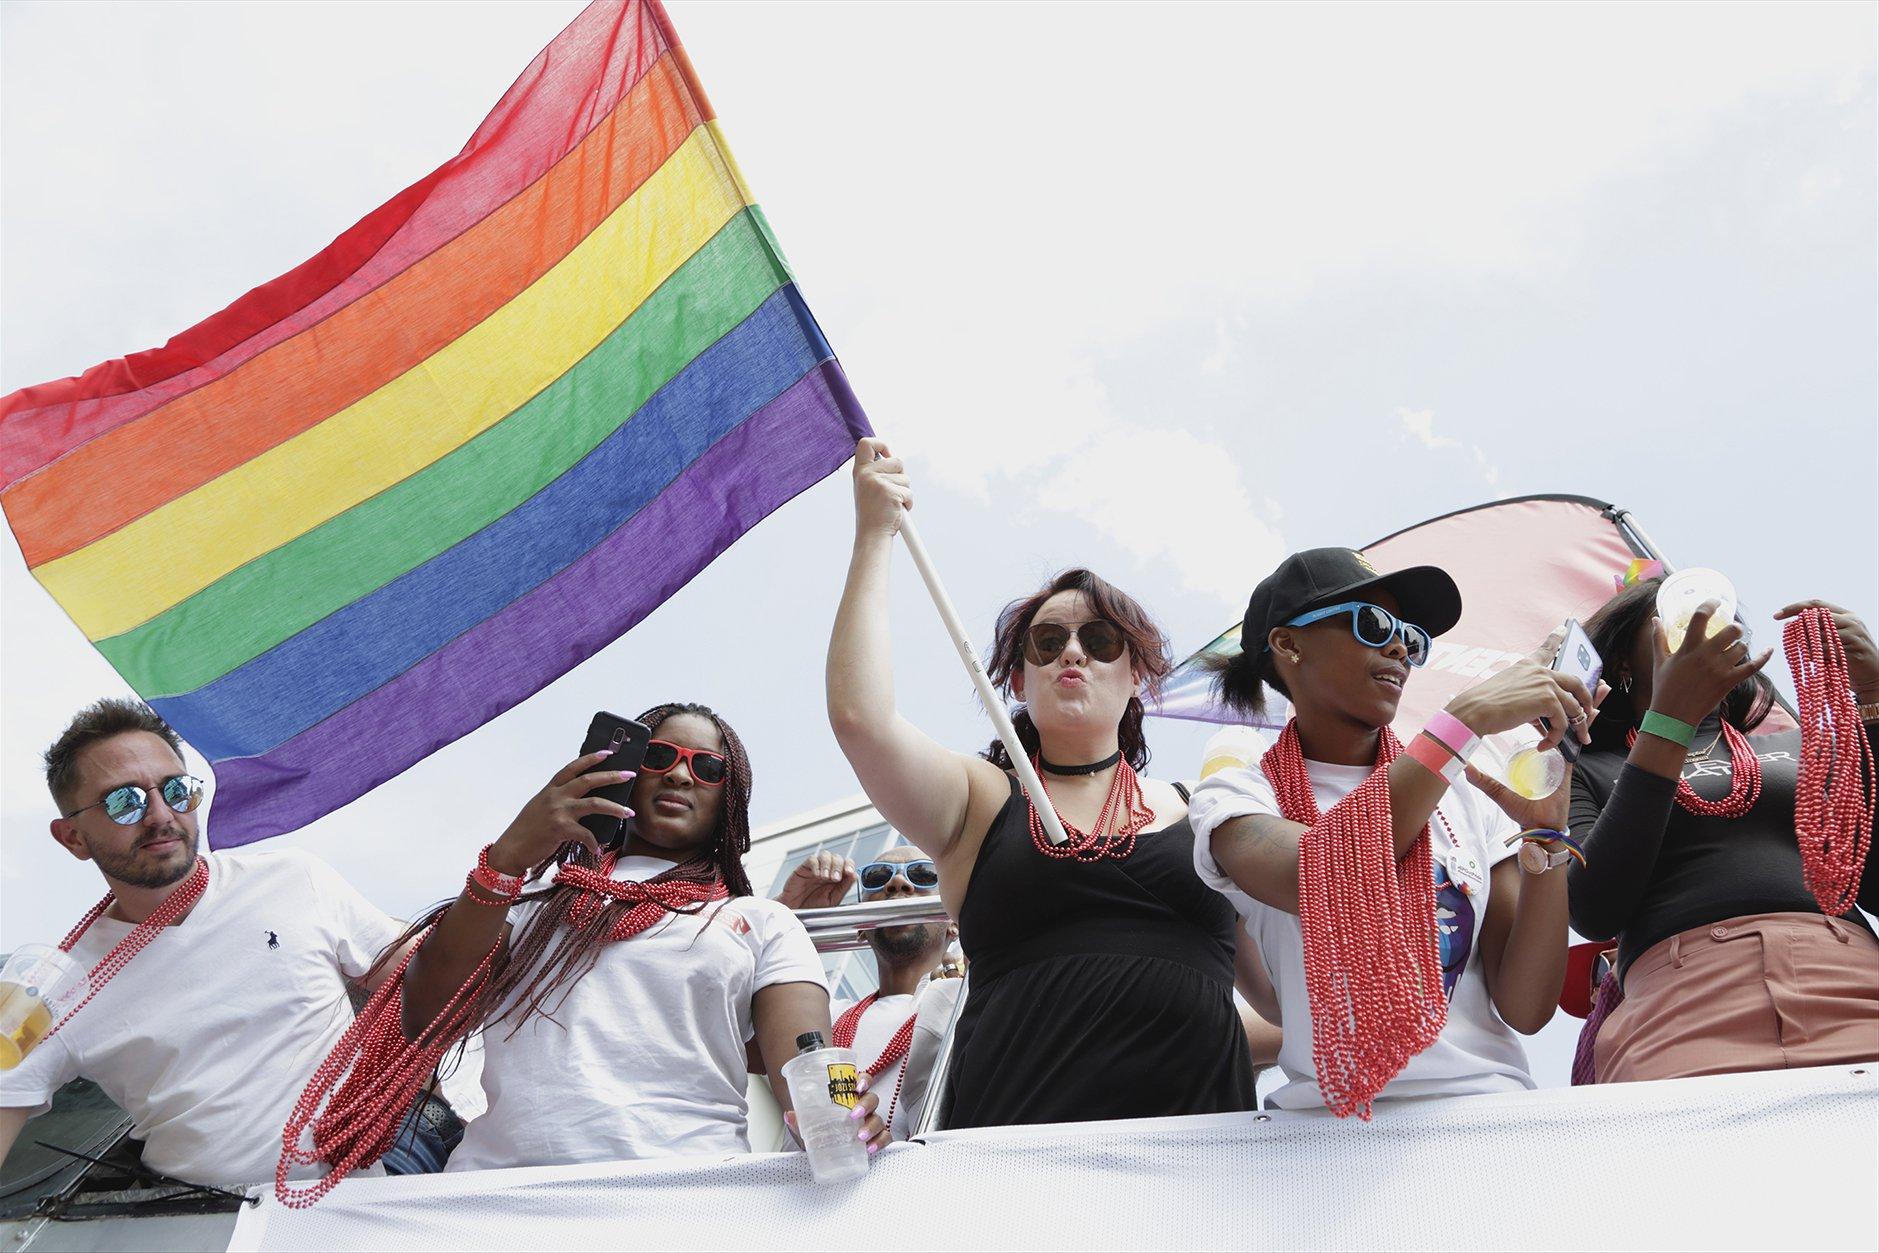 Johannesburg_Pride_LGBTQ_Noncedo Gxekwa_009.jpg